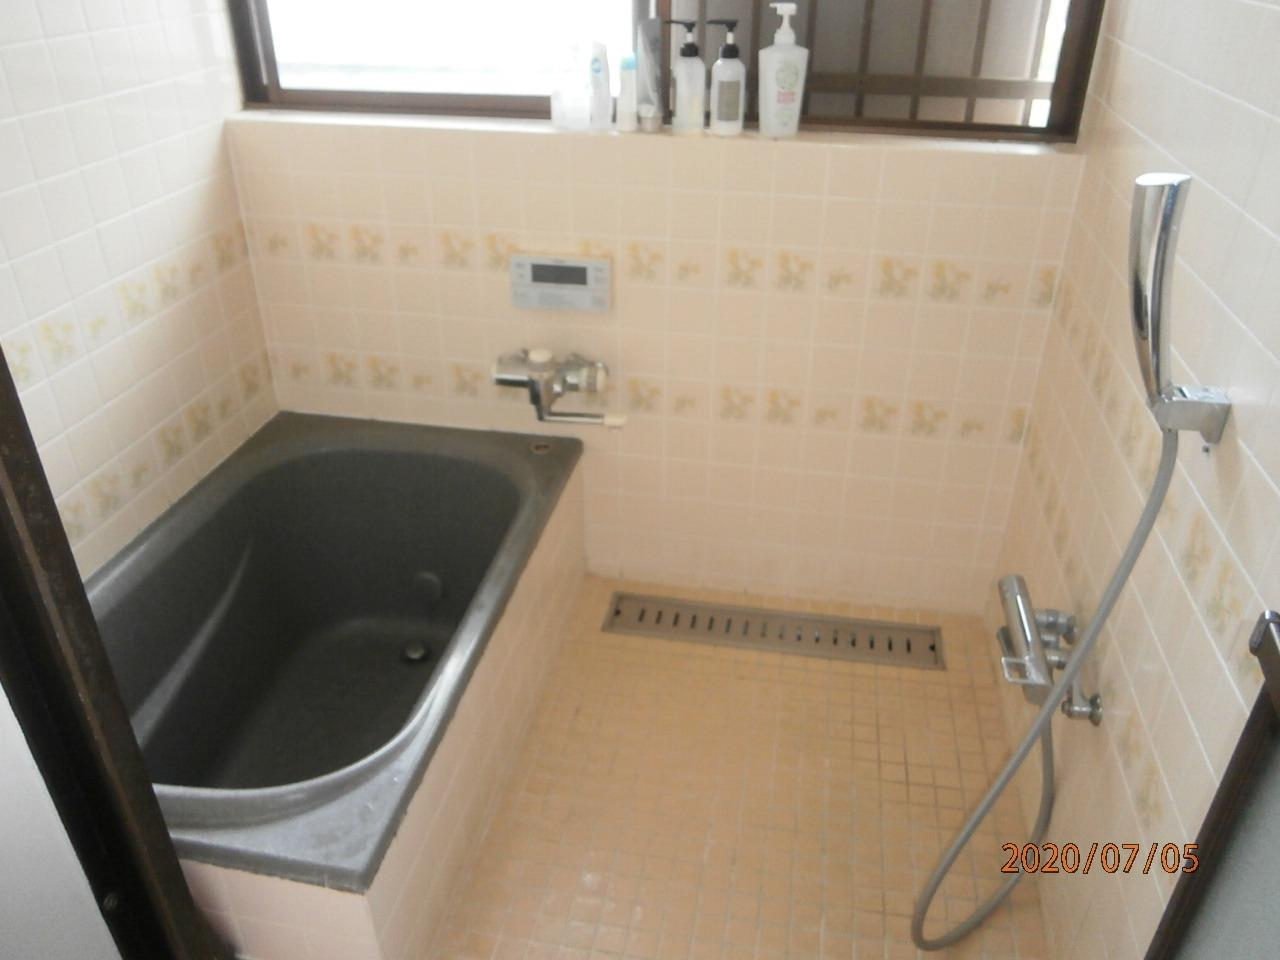 http://www.tanakajuken.com/blog/images/a6fb066dd5b0f5f226c71c8b9287f2155470a2af.JPG